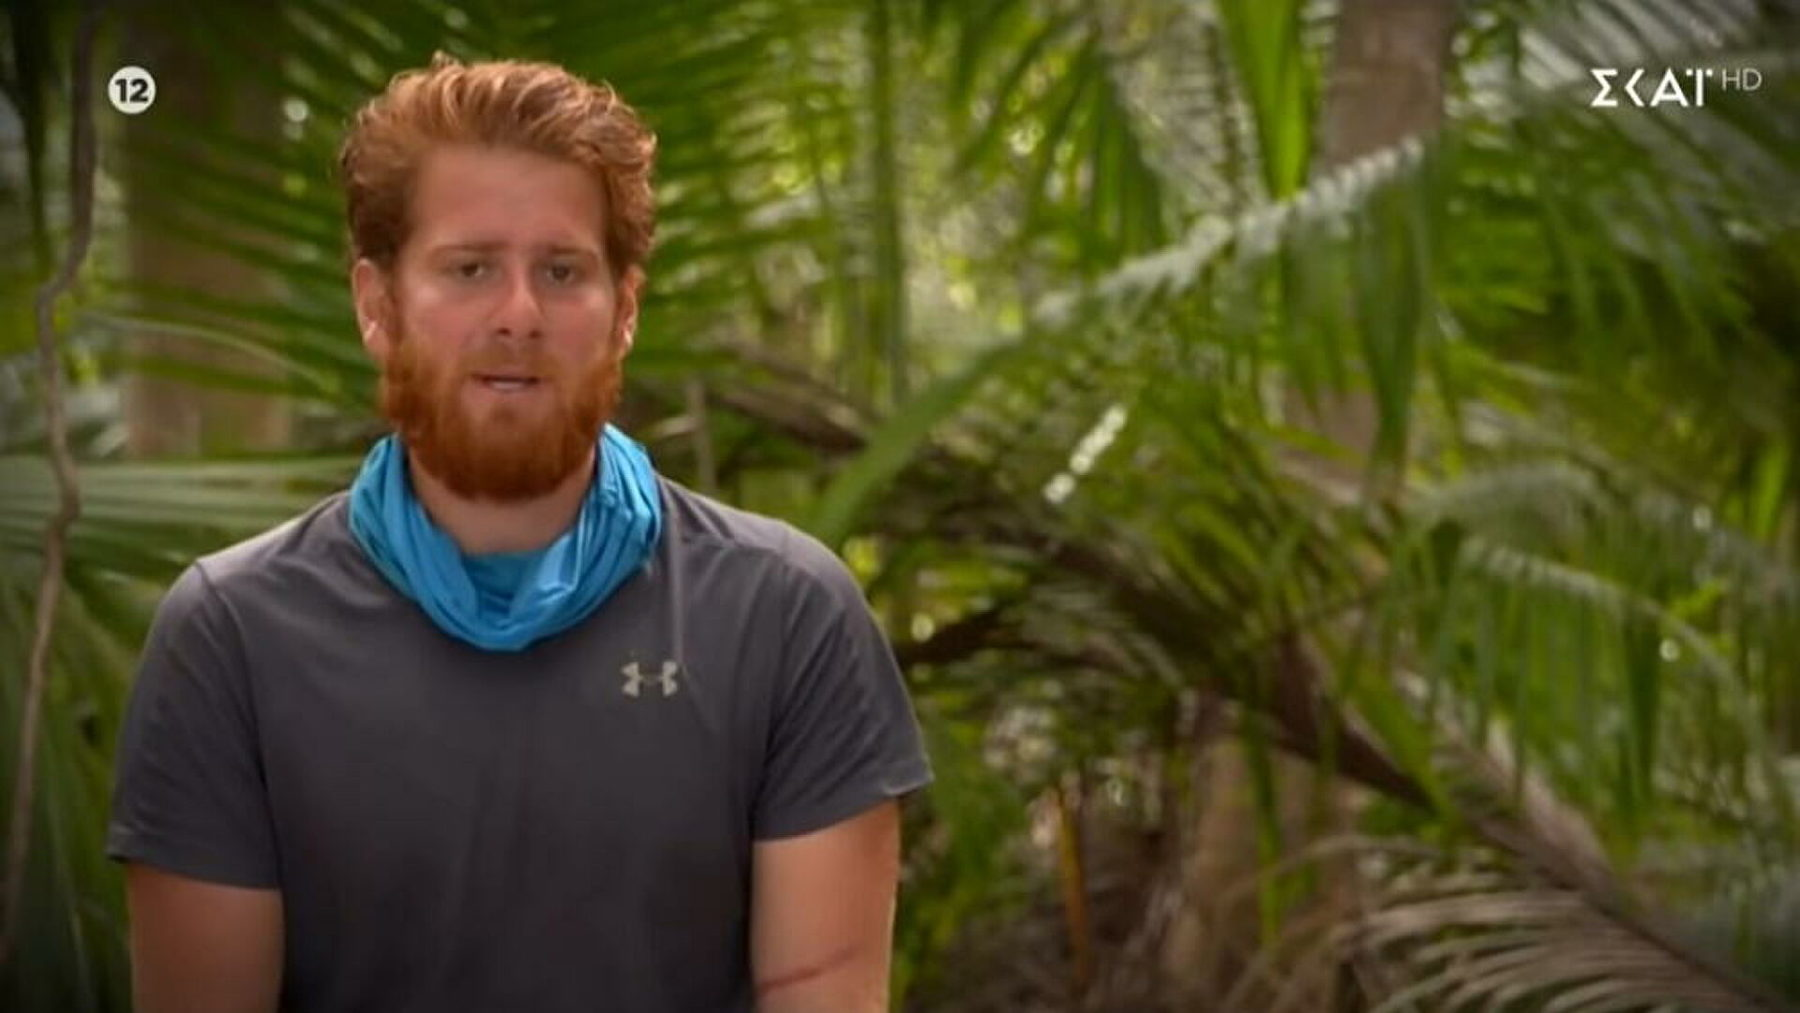 Survivor 4: «Κάηκε» η Ρόδος στην επιστροφή του Τζέιμς! Μαζί του η Άννα Μαρία Βέλλη